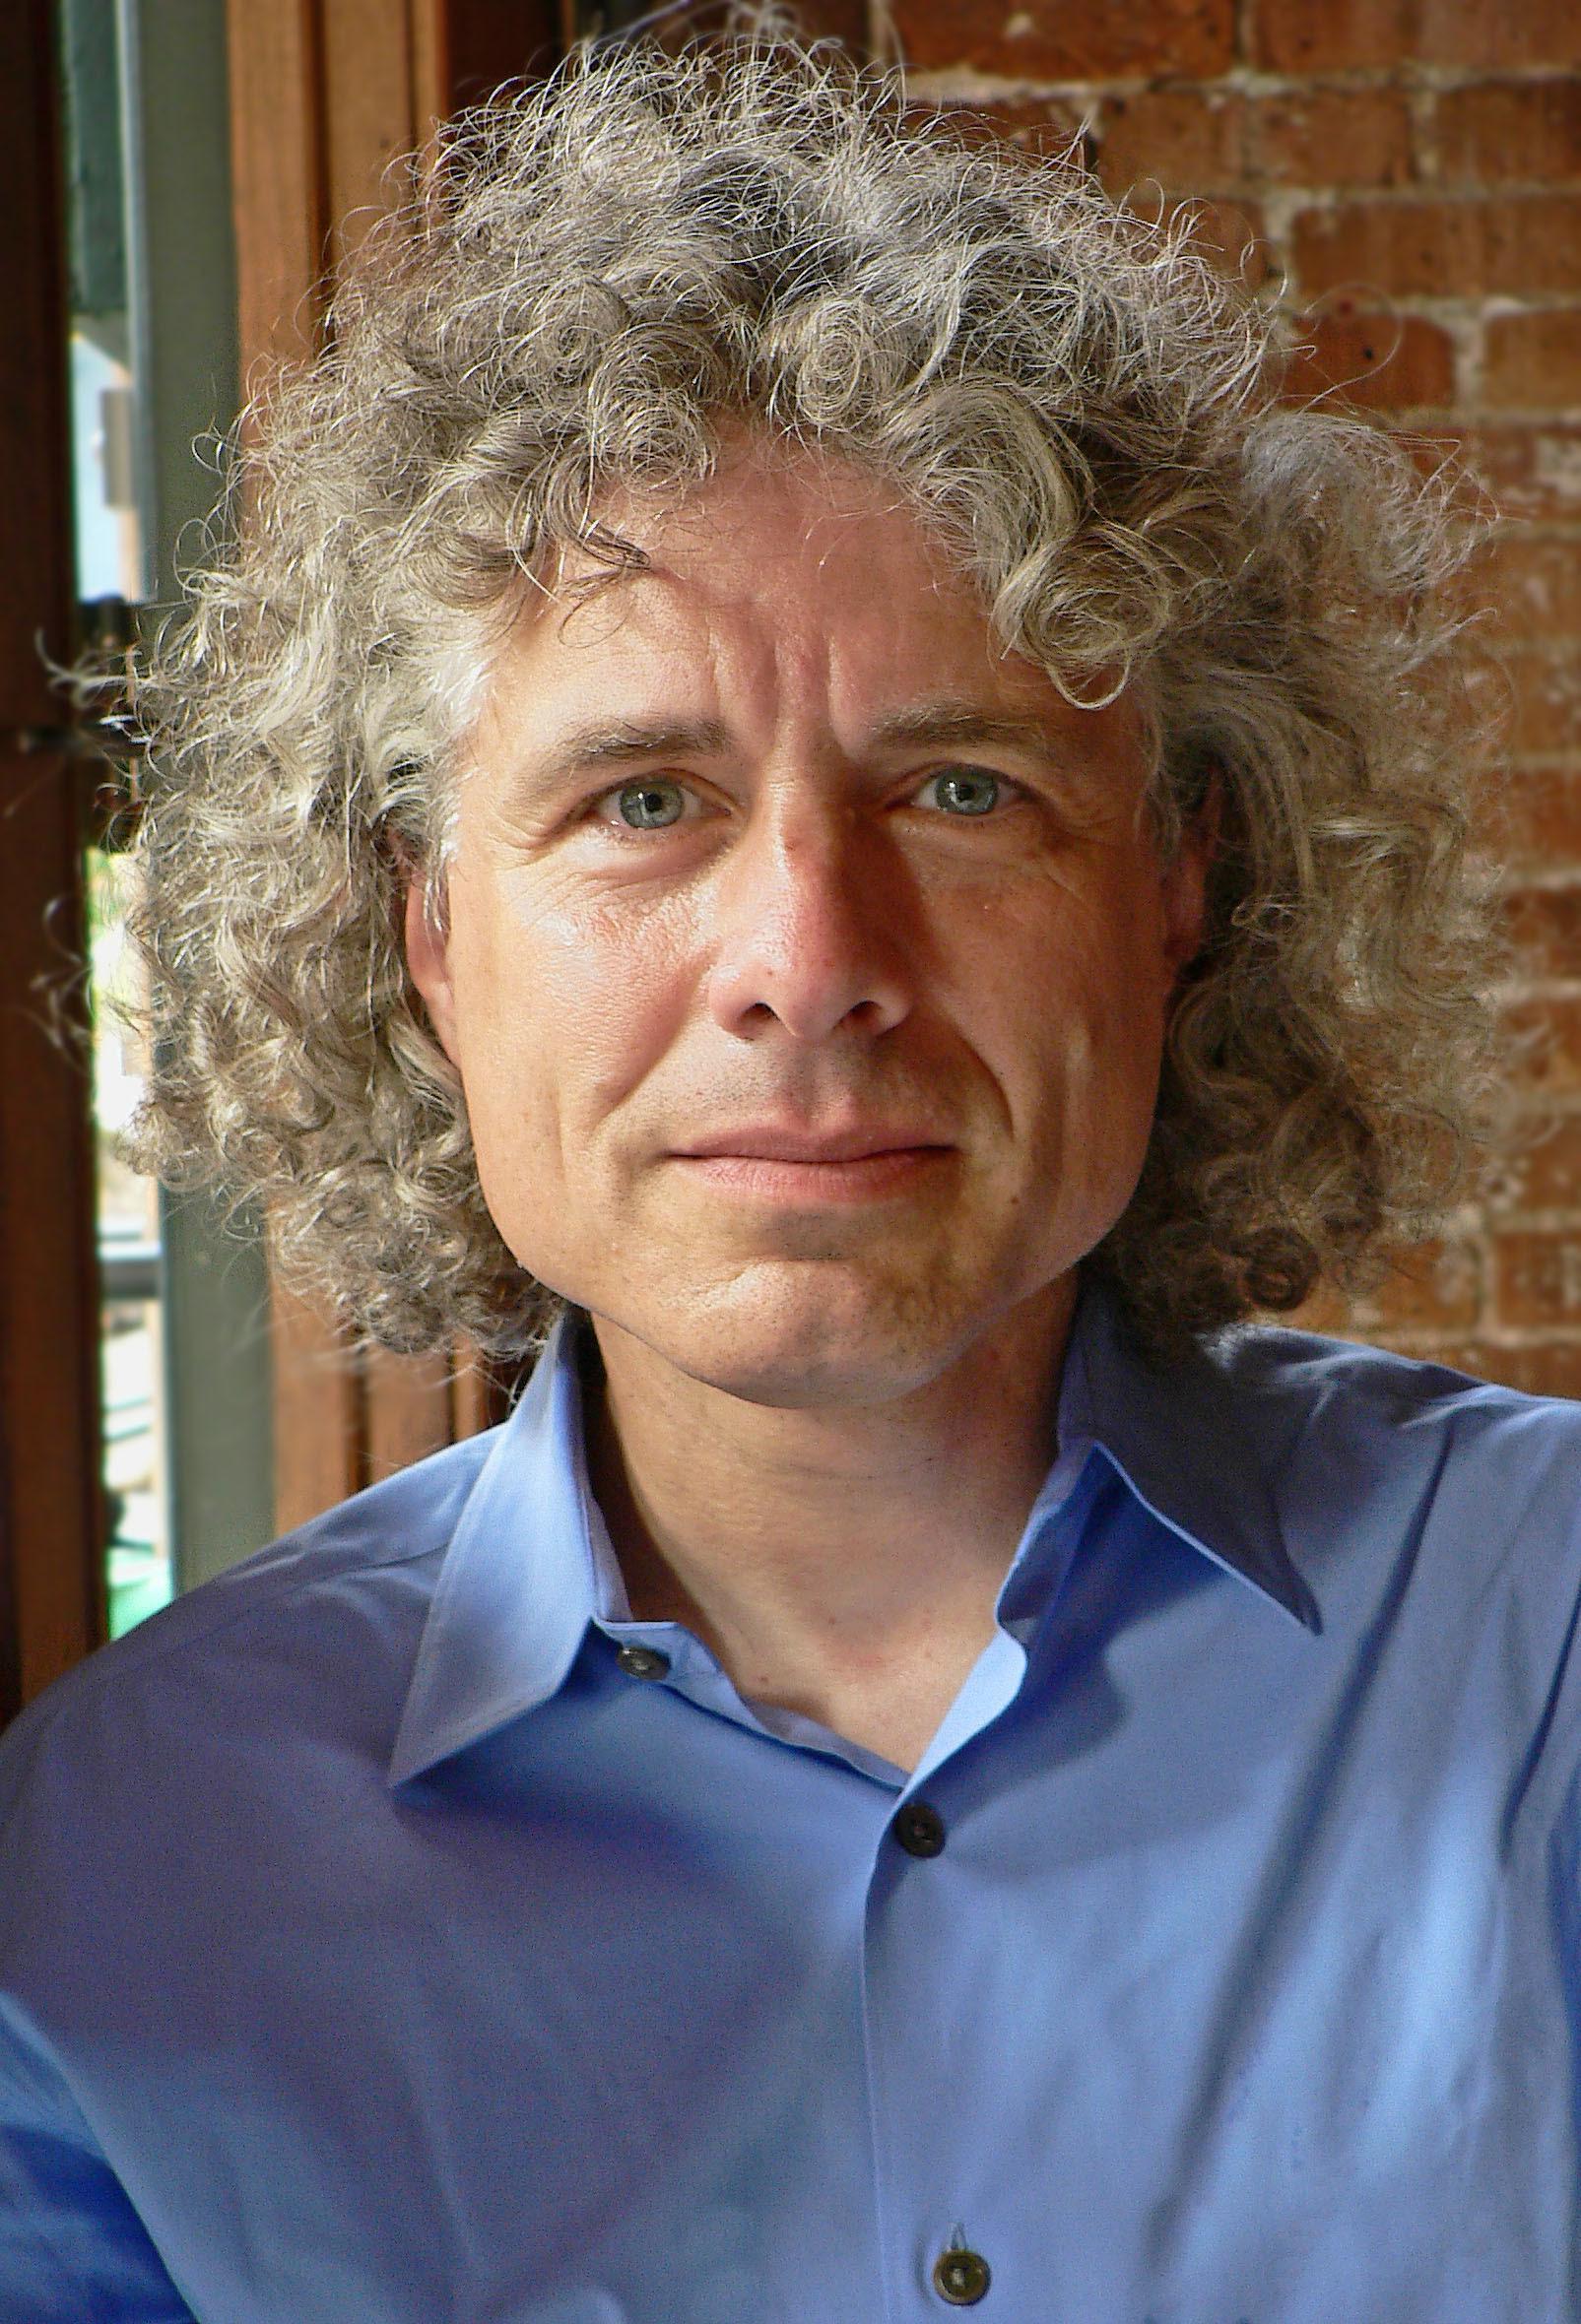 Steven Pinker's New Scientism